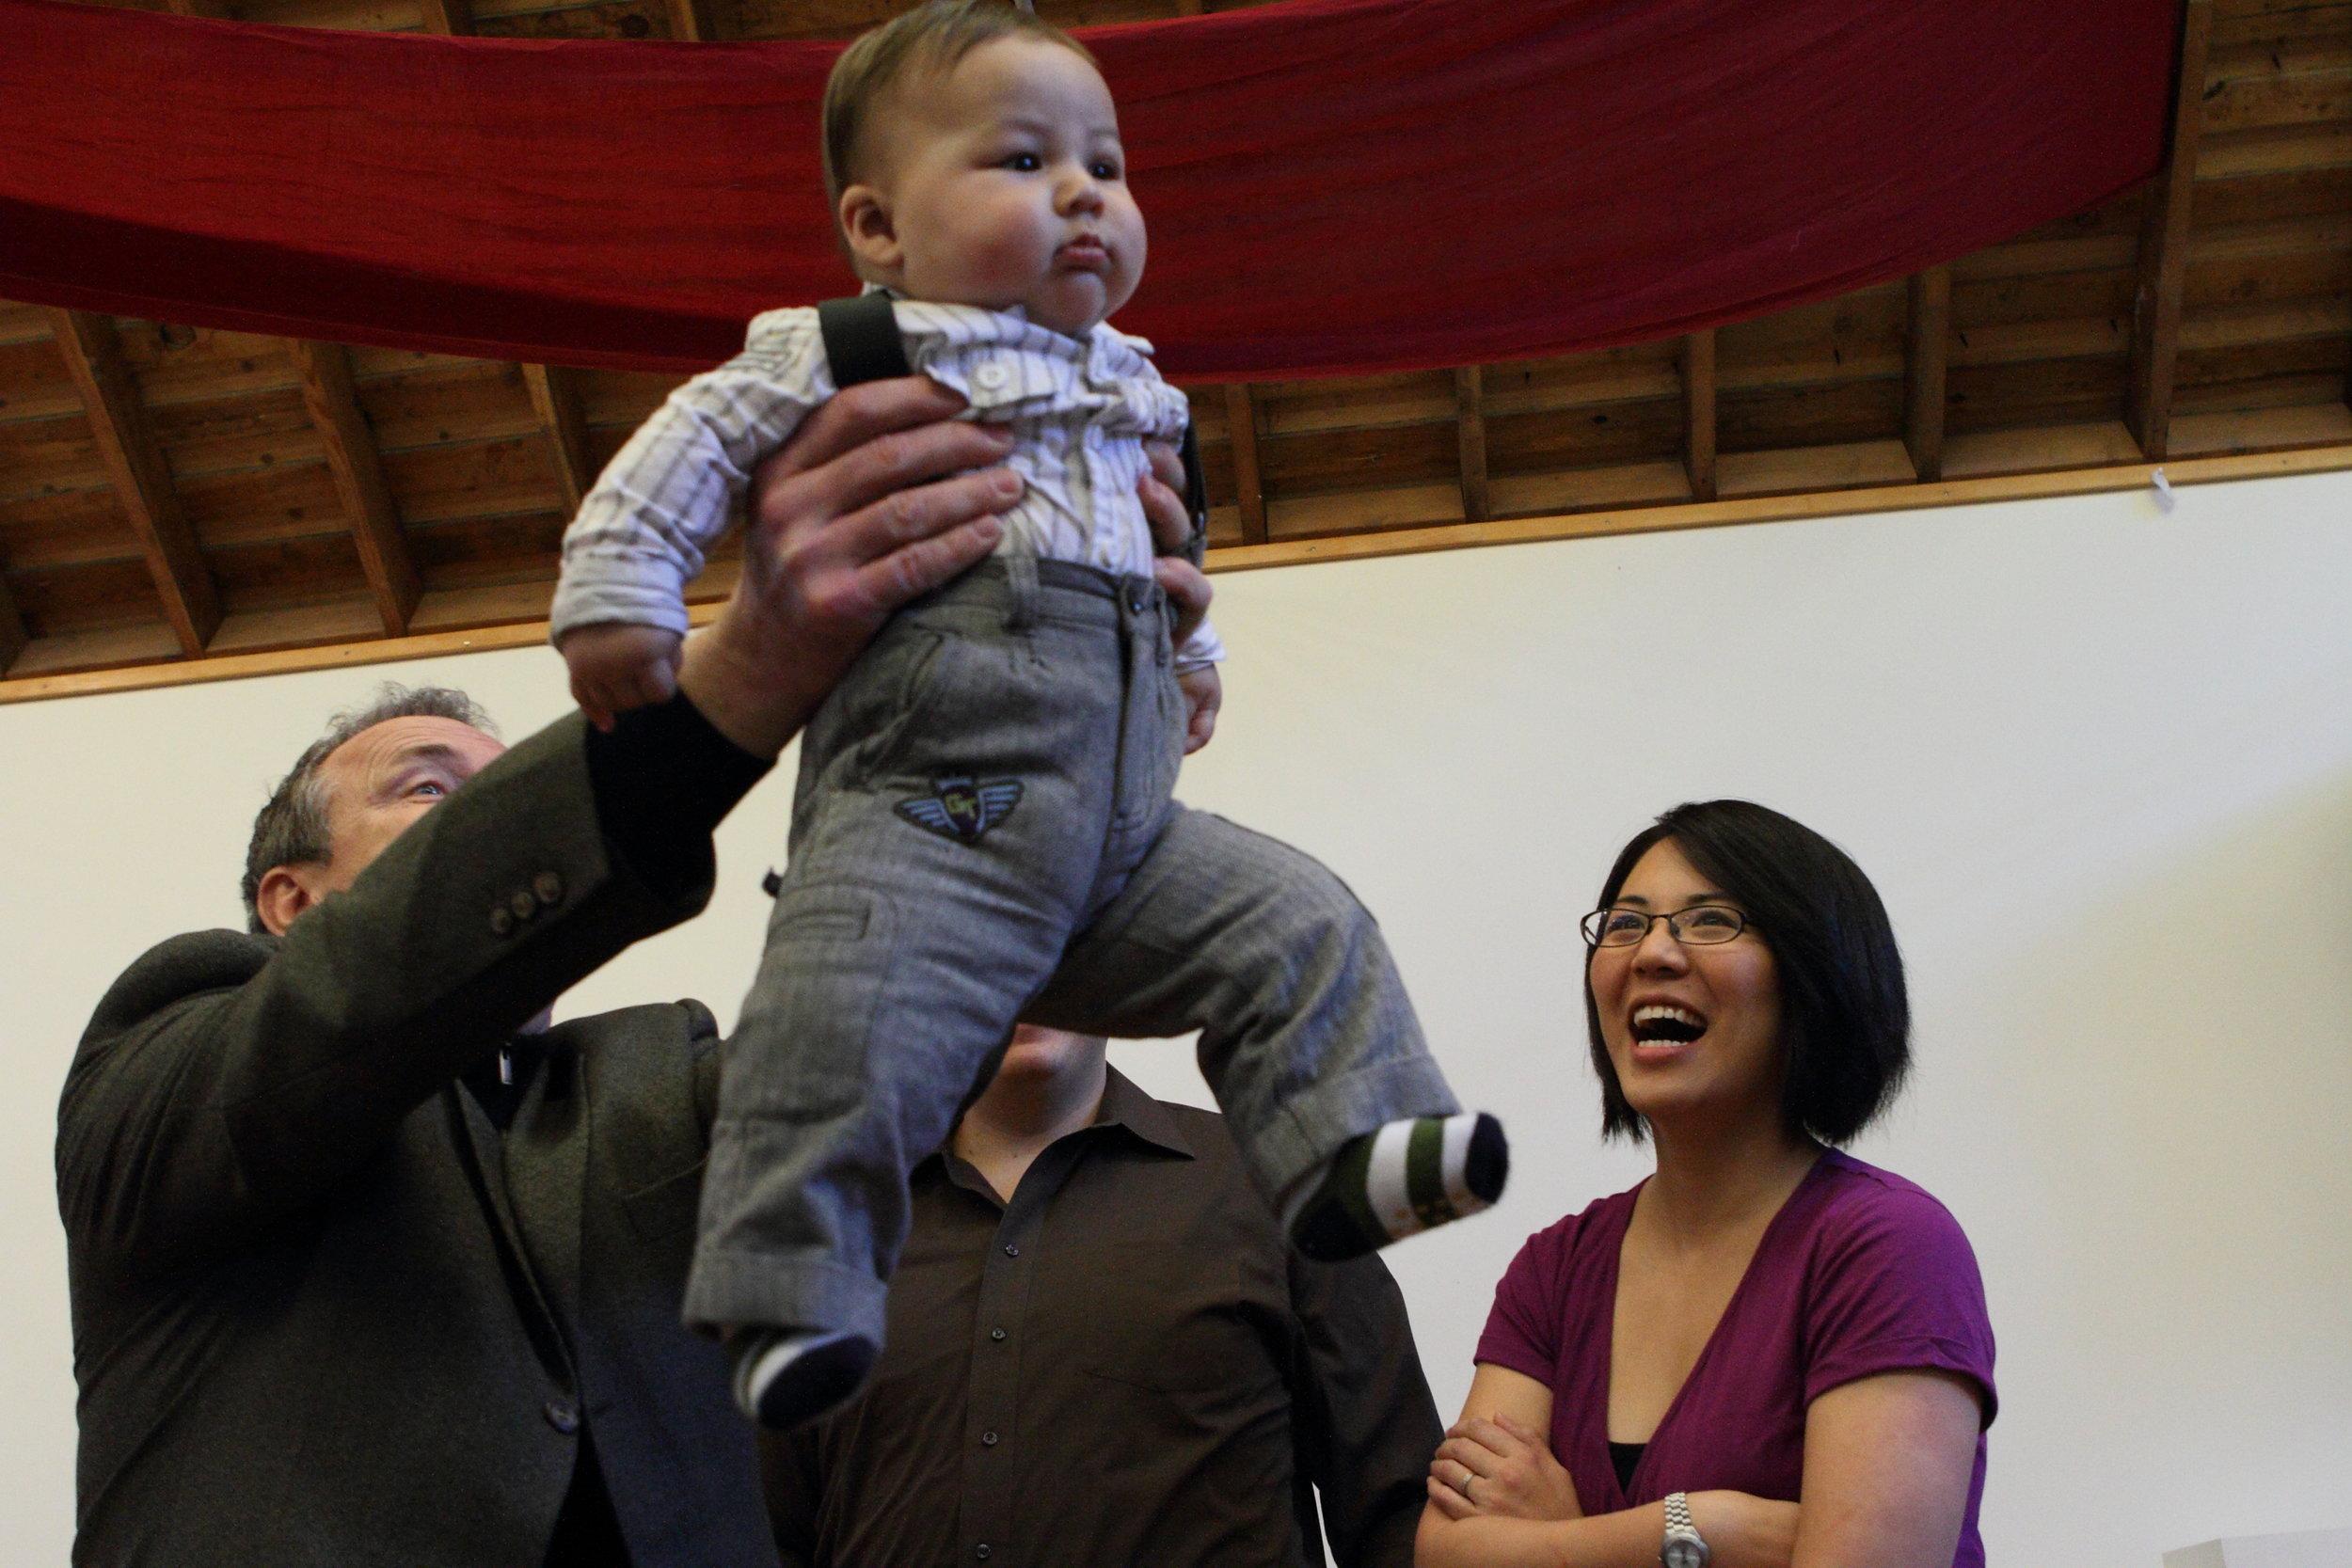 I photographed a  boy's baptism  at his parents' request.